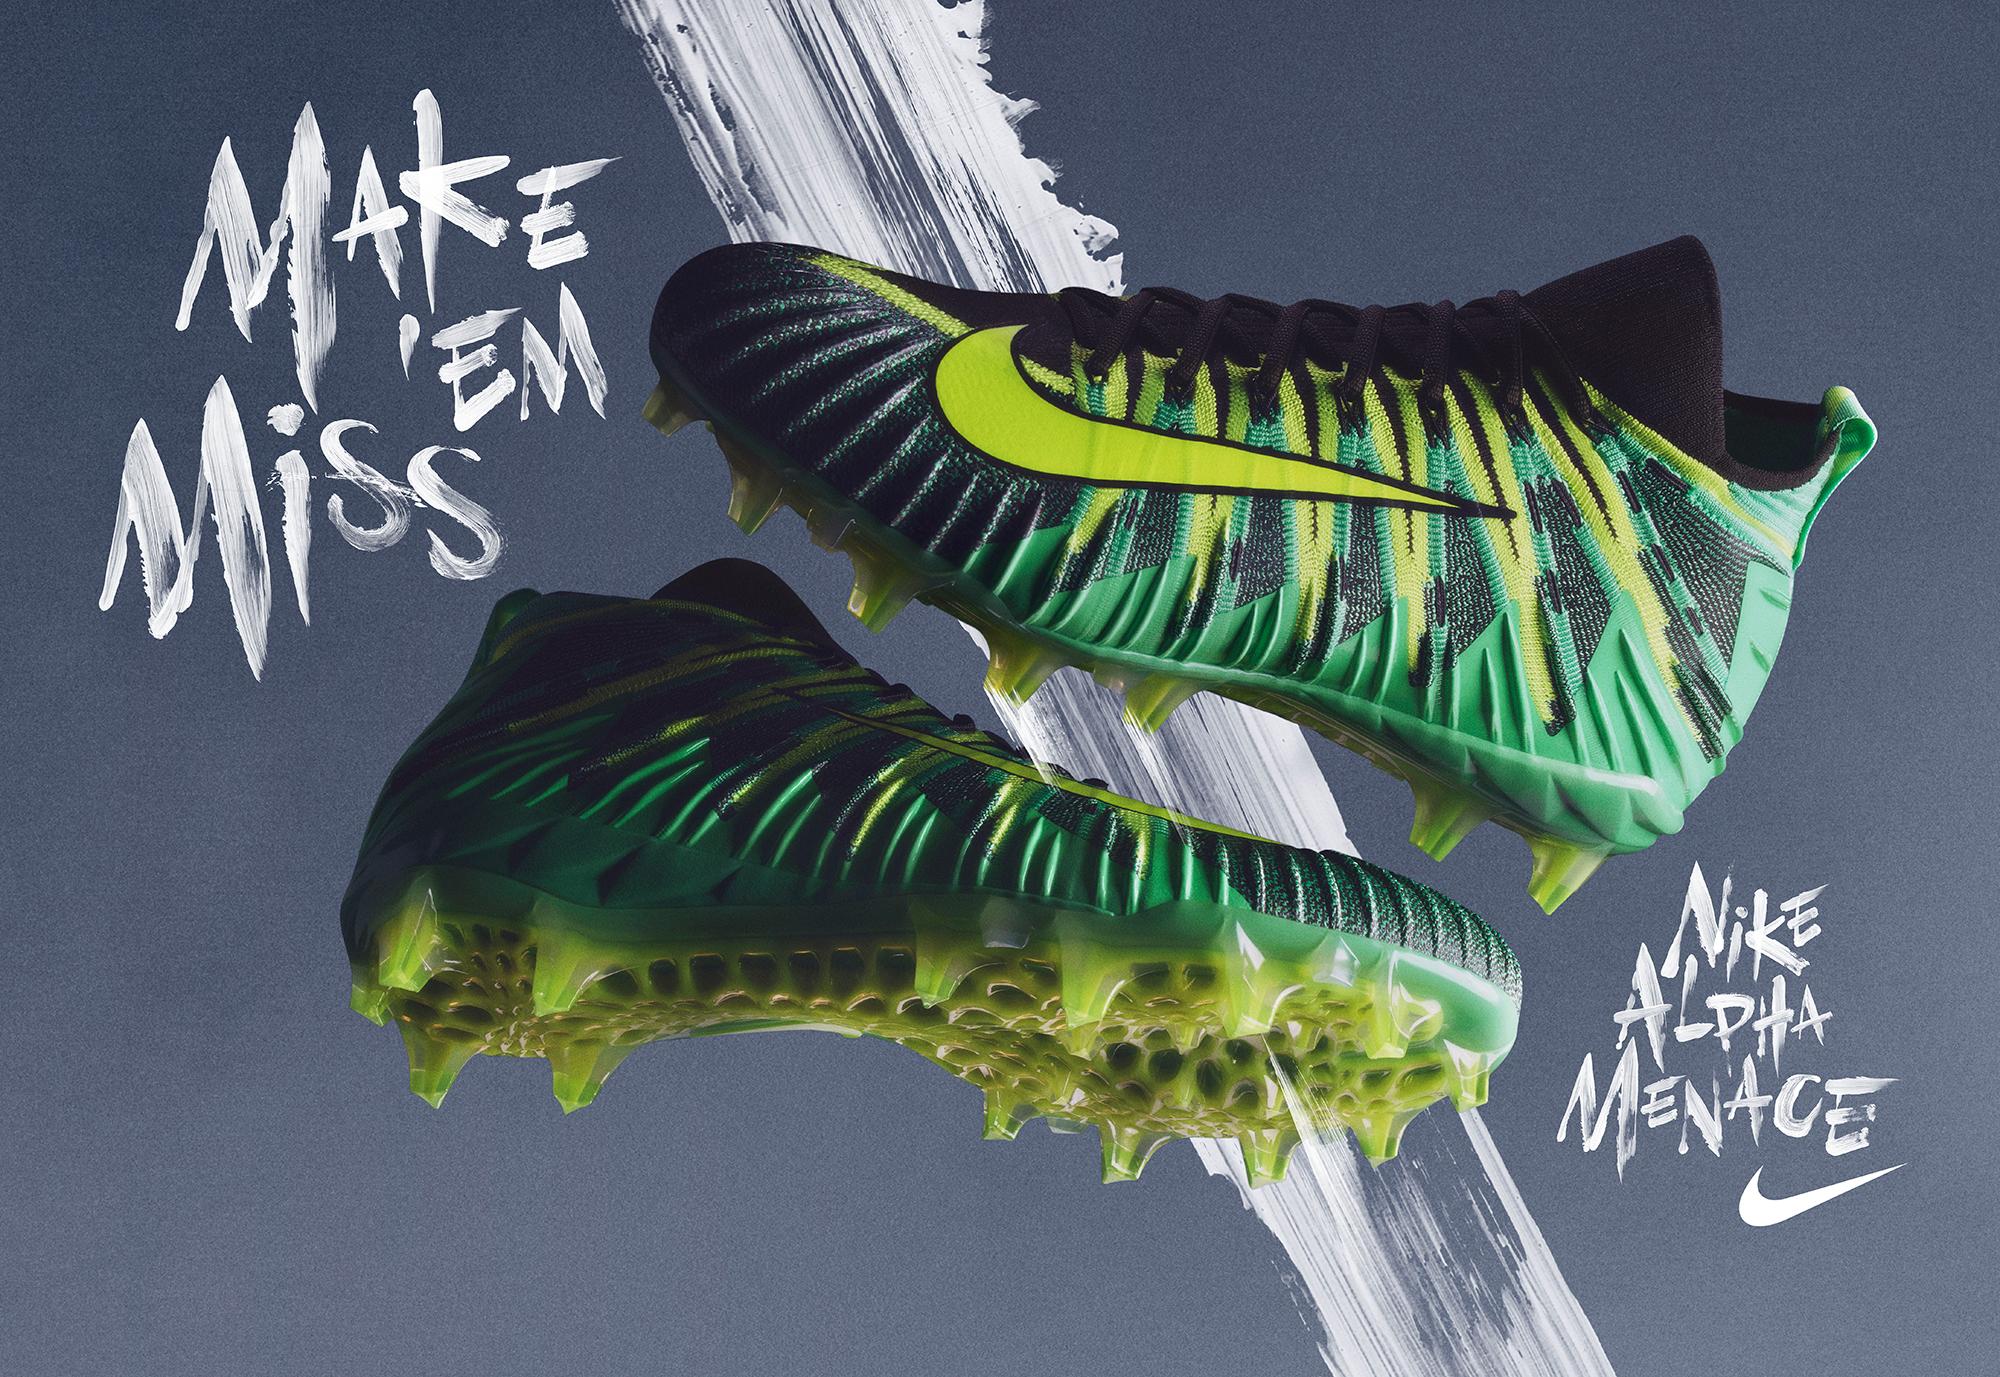 Nike Alpha Menace by Alexis Tyrsa | Agent Pekka